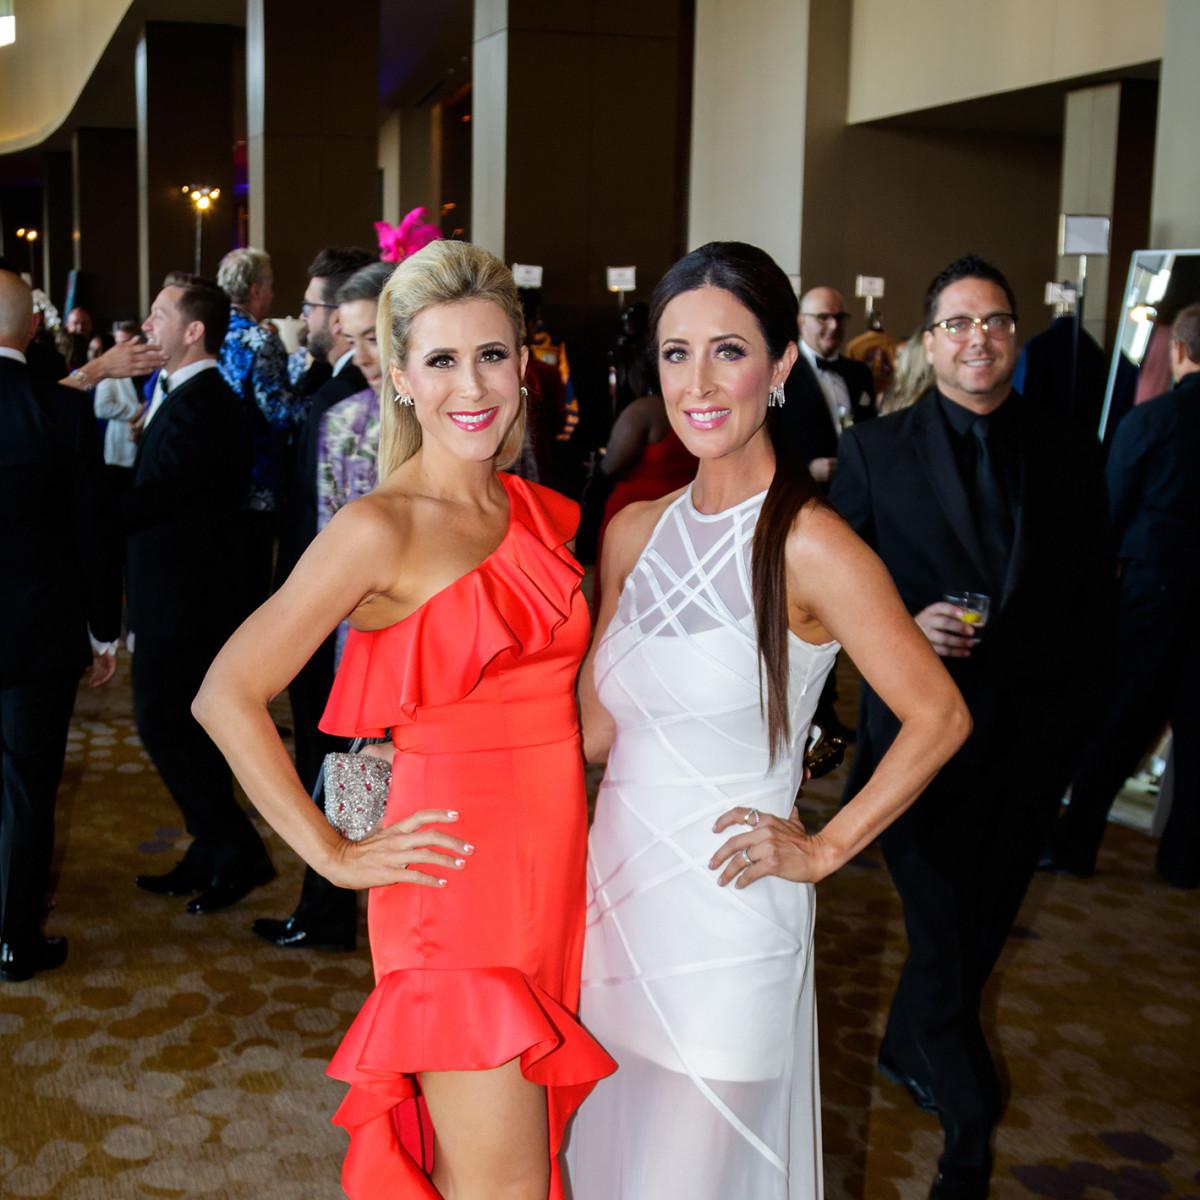 Stephanie McElroy, Megan Bennett at House of DIFFA 2018